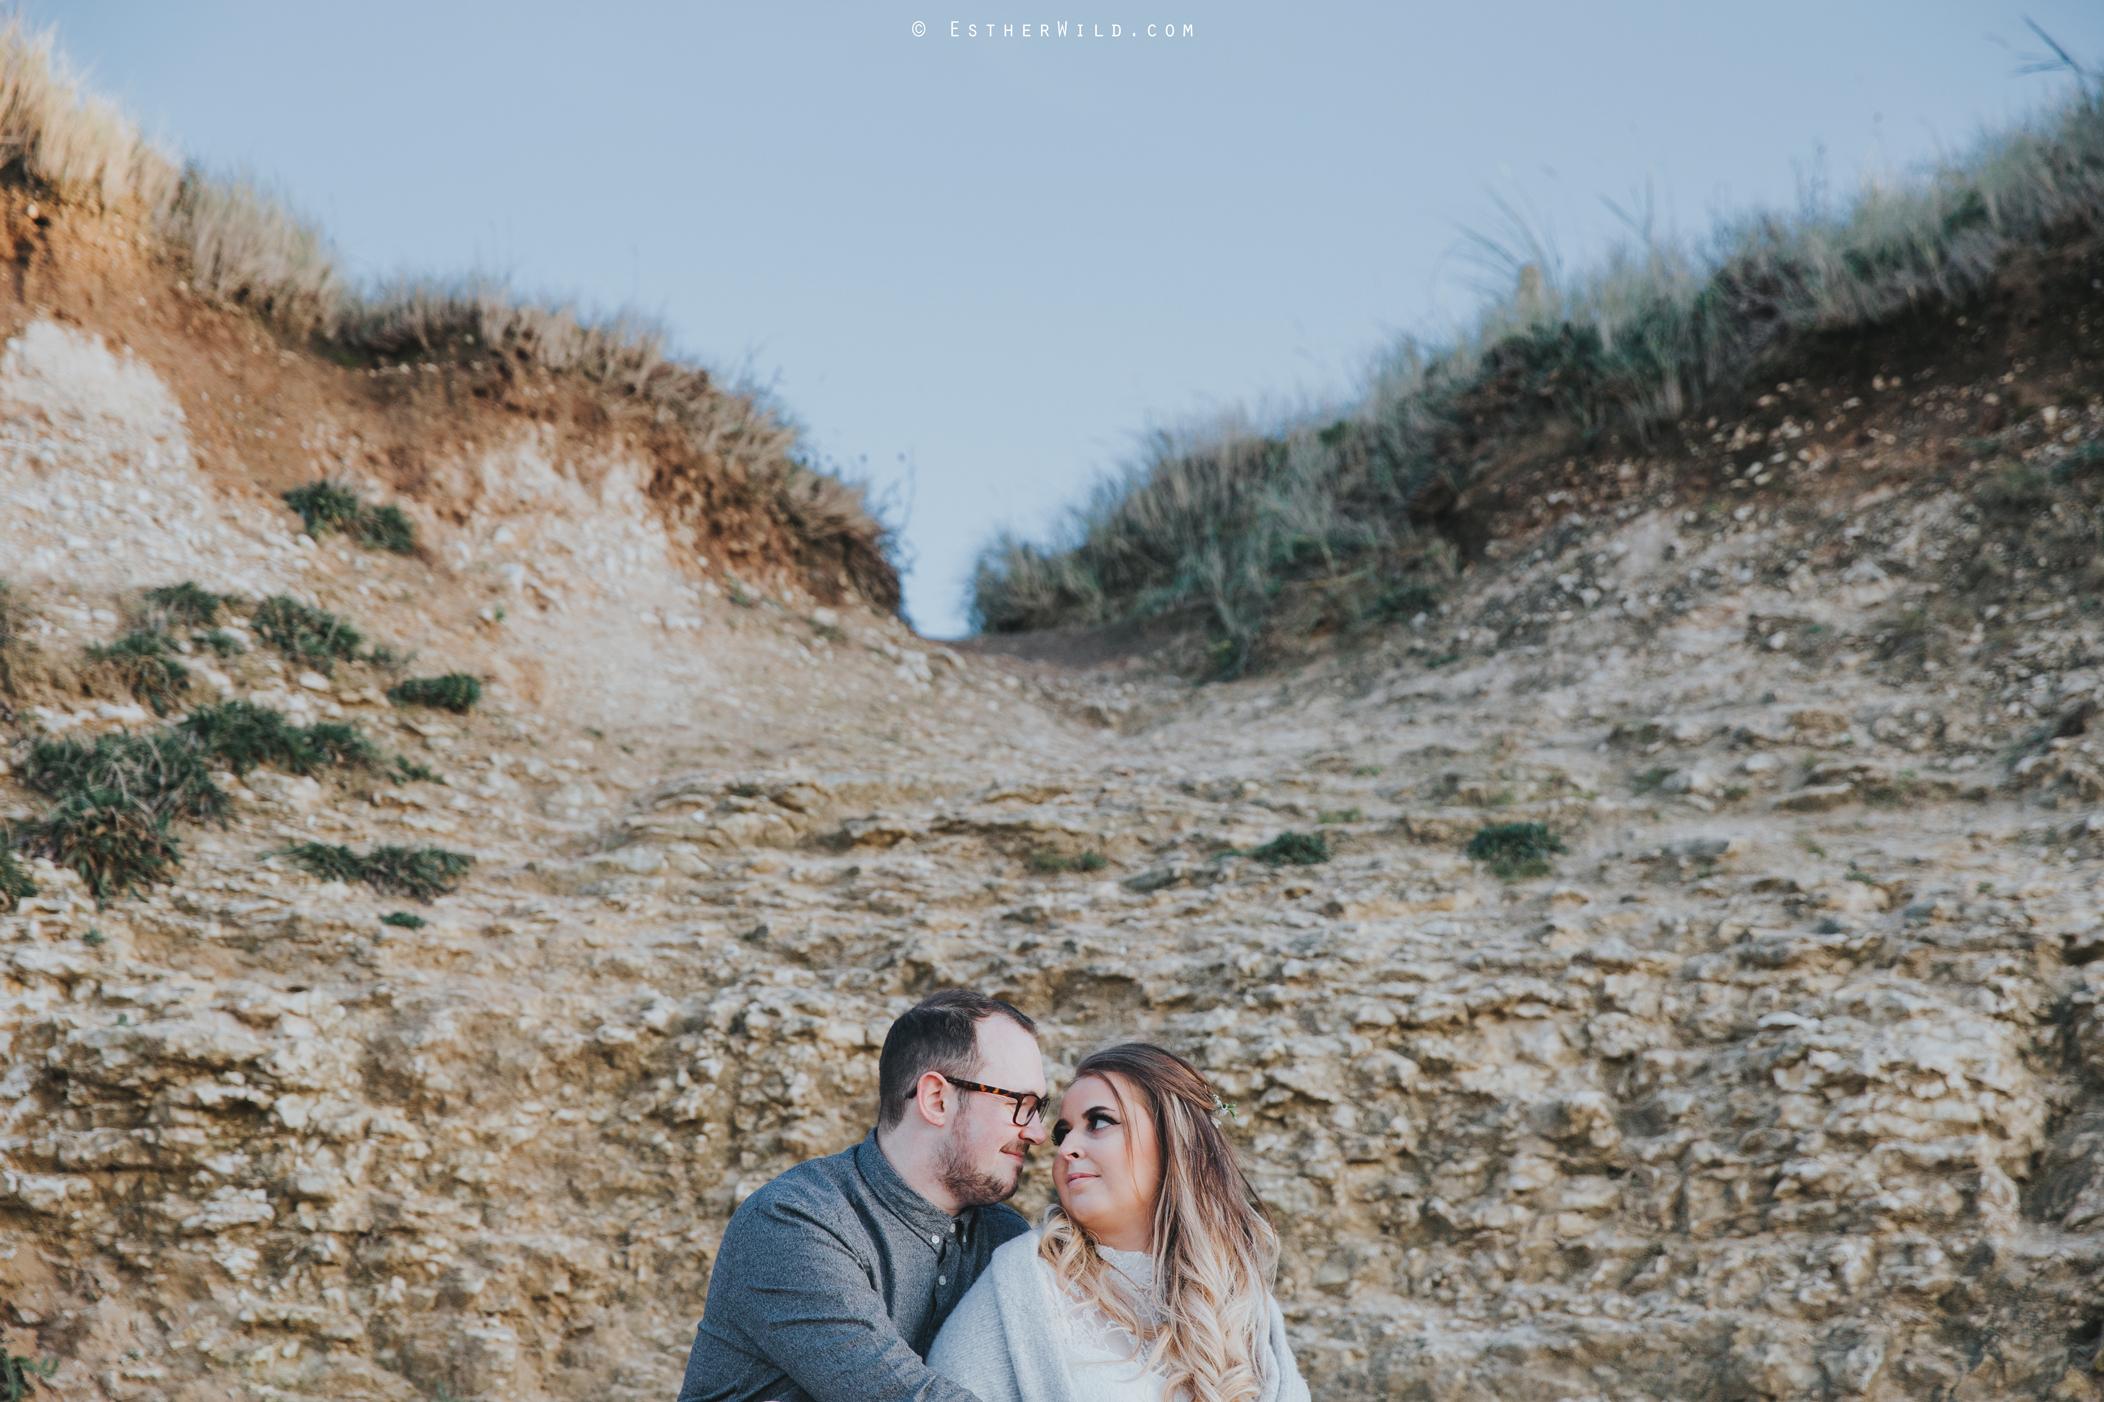 Couple_Anniversary_Wedding_Photography_Hunstanton_Norfolk_Esther_Wild_Share_Copy_IMG_8944.jpg